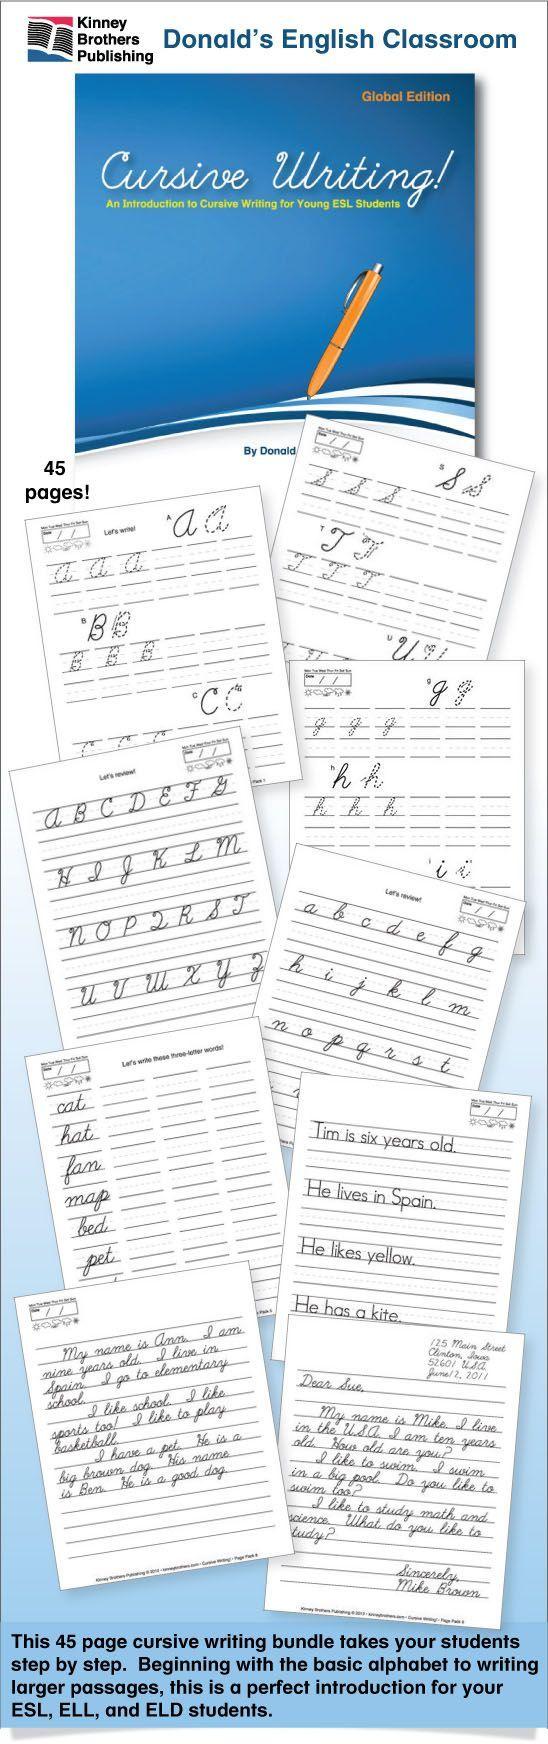 Cursive Handwriting Worksheets Teaching Cursive Cursive Writing Teaching Cursive Writing [ 1744 x 548 Pixel ]